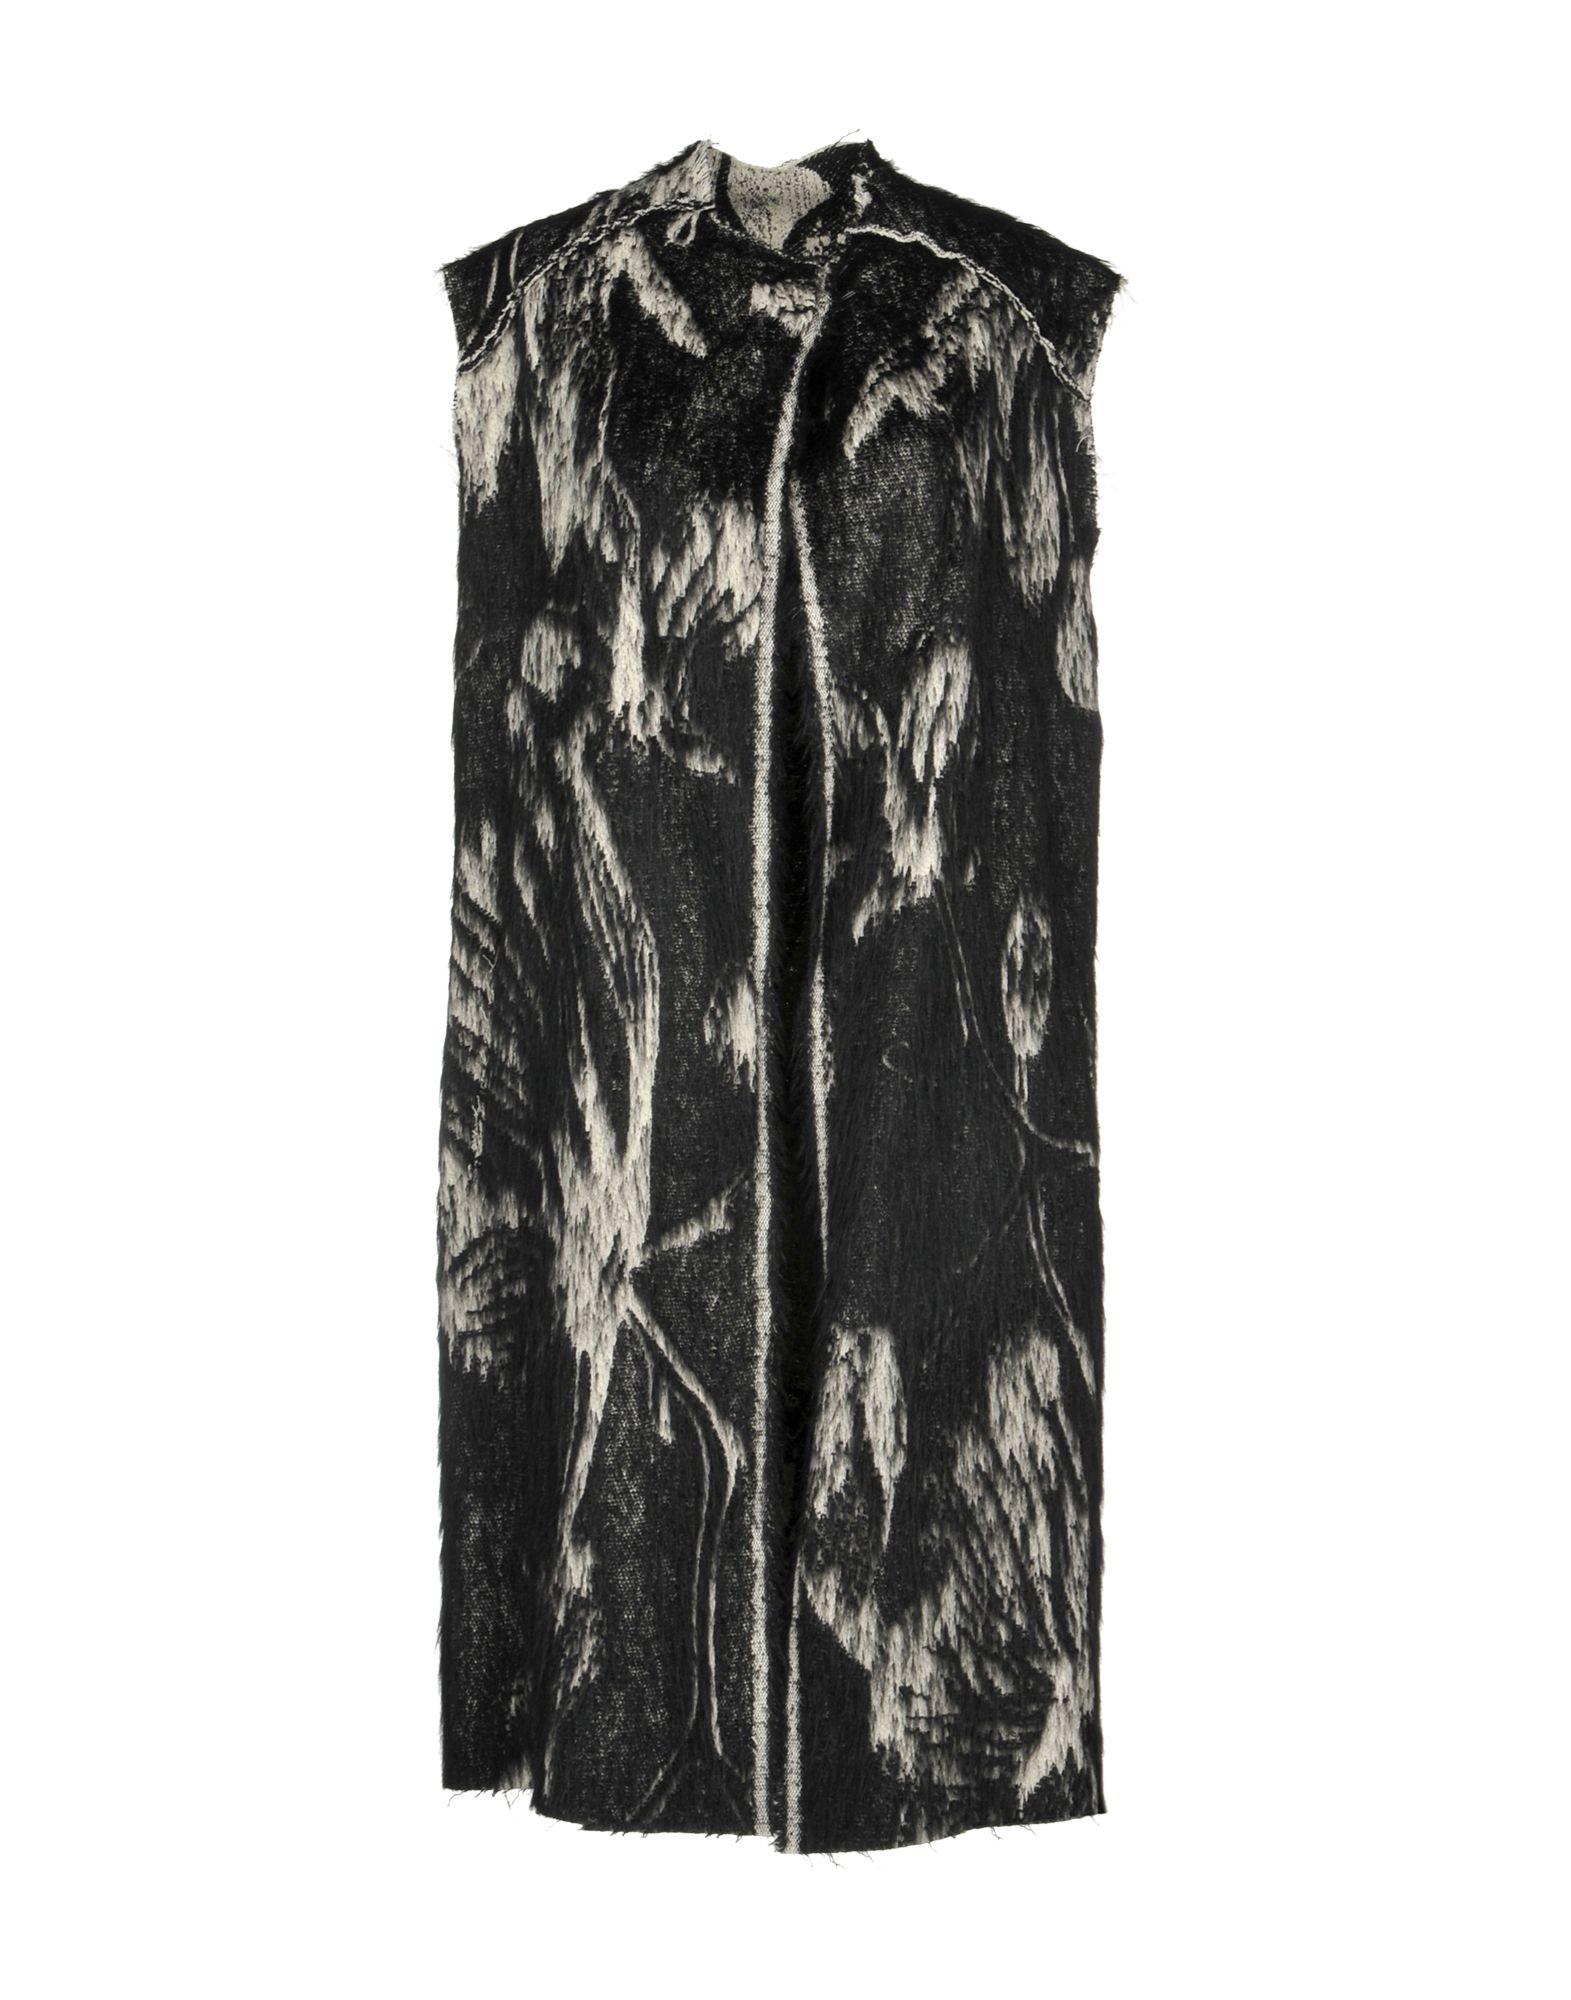 SIMONA TAGLIAFERRI Coat in Black